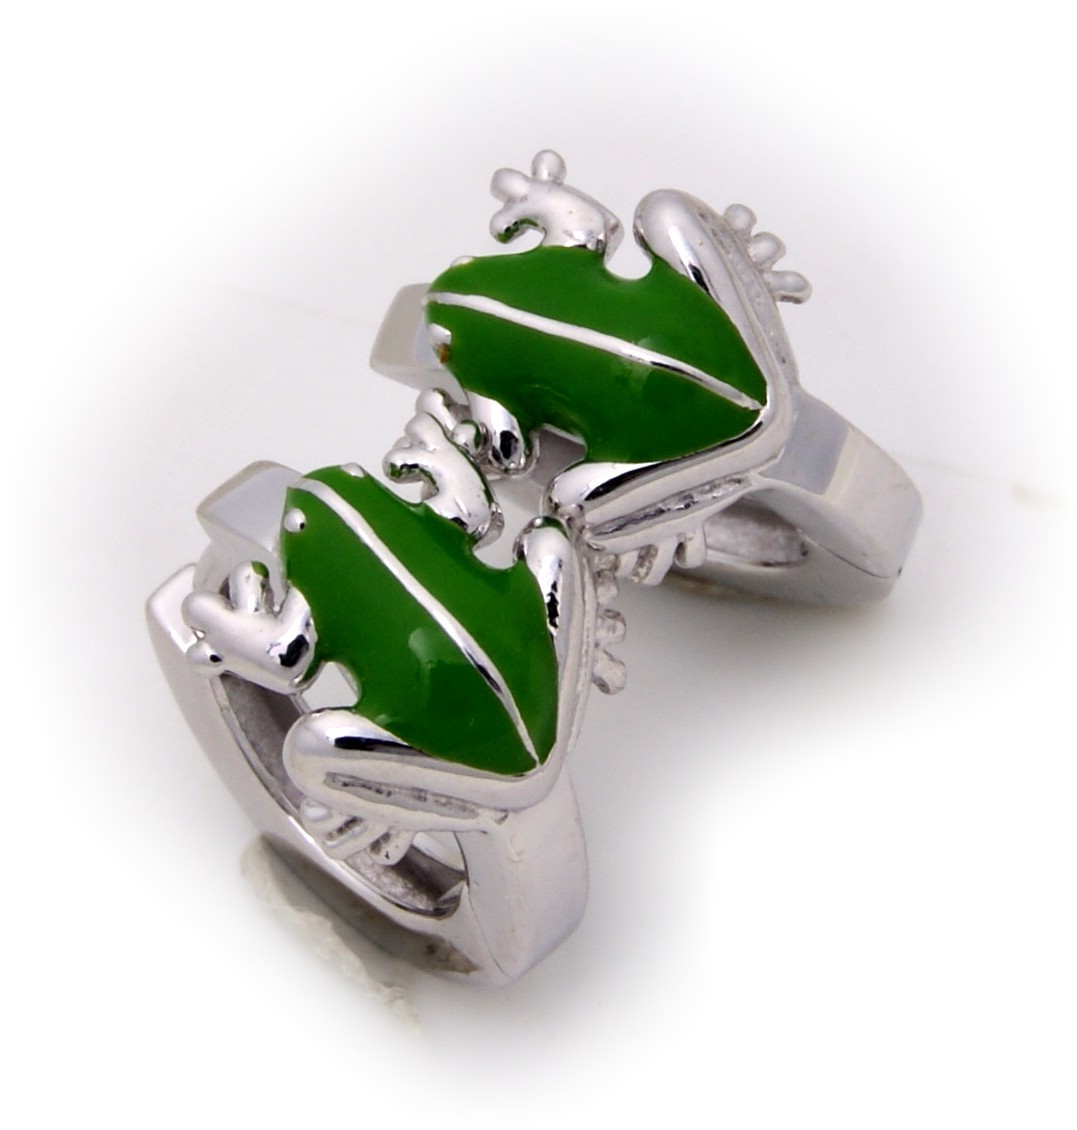 Kinder Ohrringe Klapp Creolen Frosch Silber 925 grün gelackt